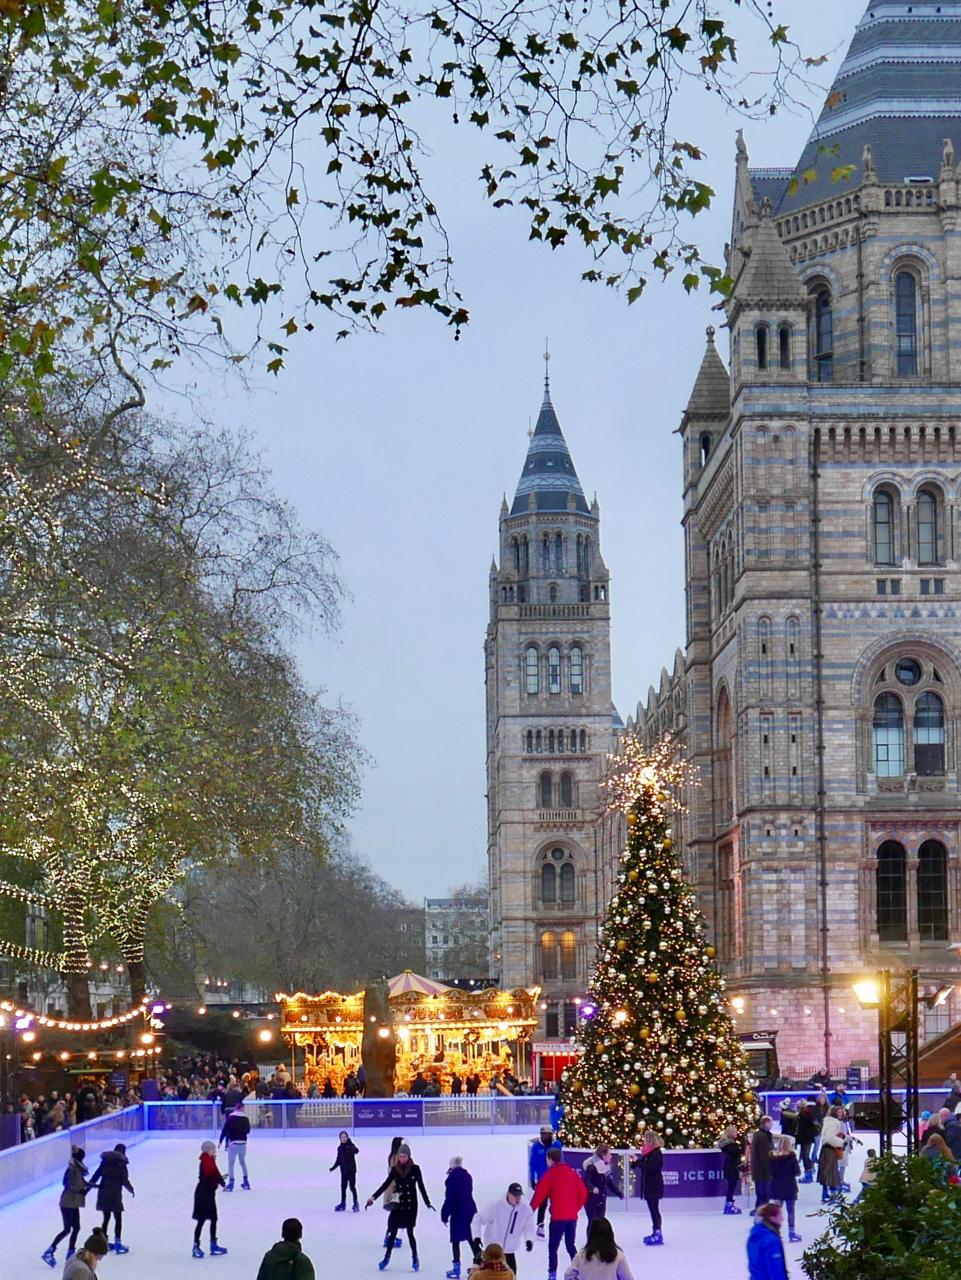 Cara Sharratt Travel - Natural History Museum at Christmas - London, England